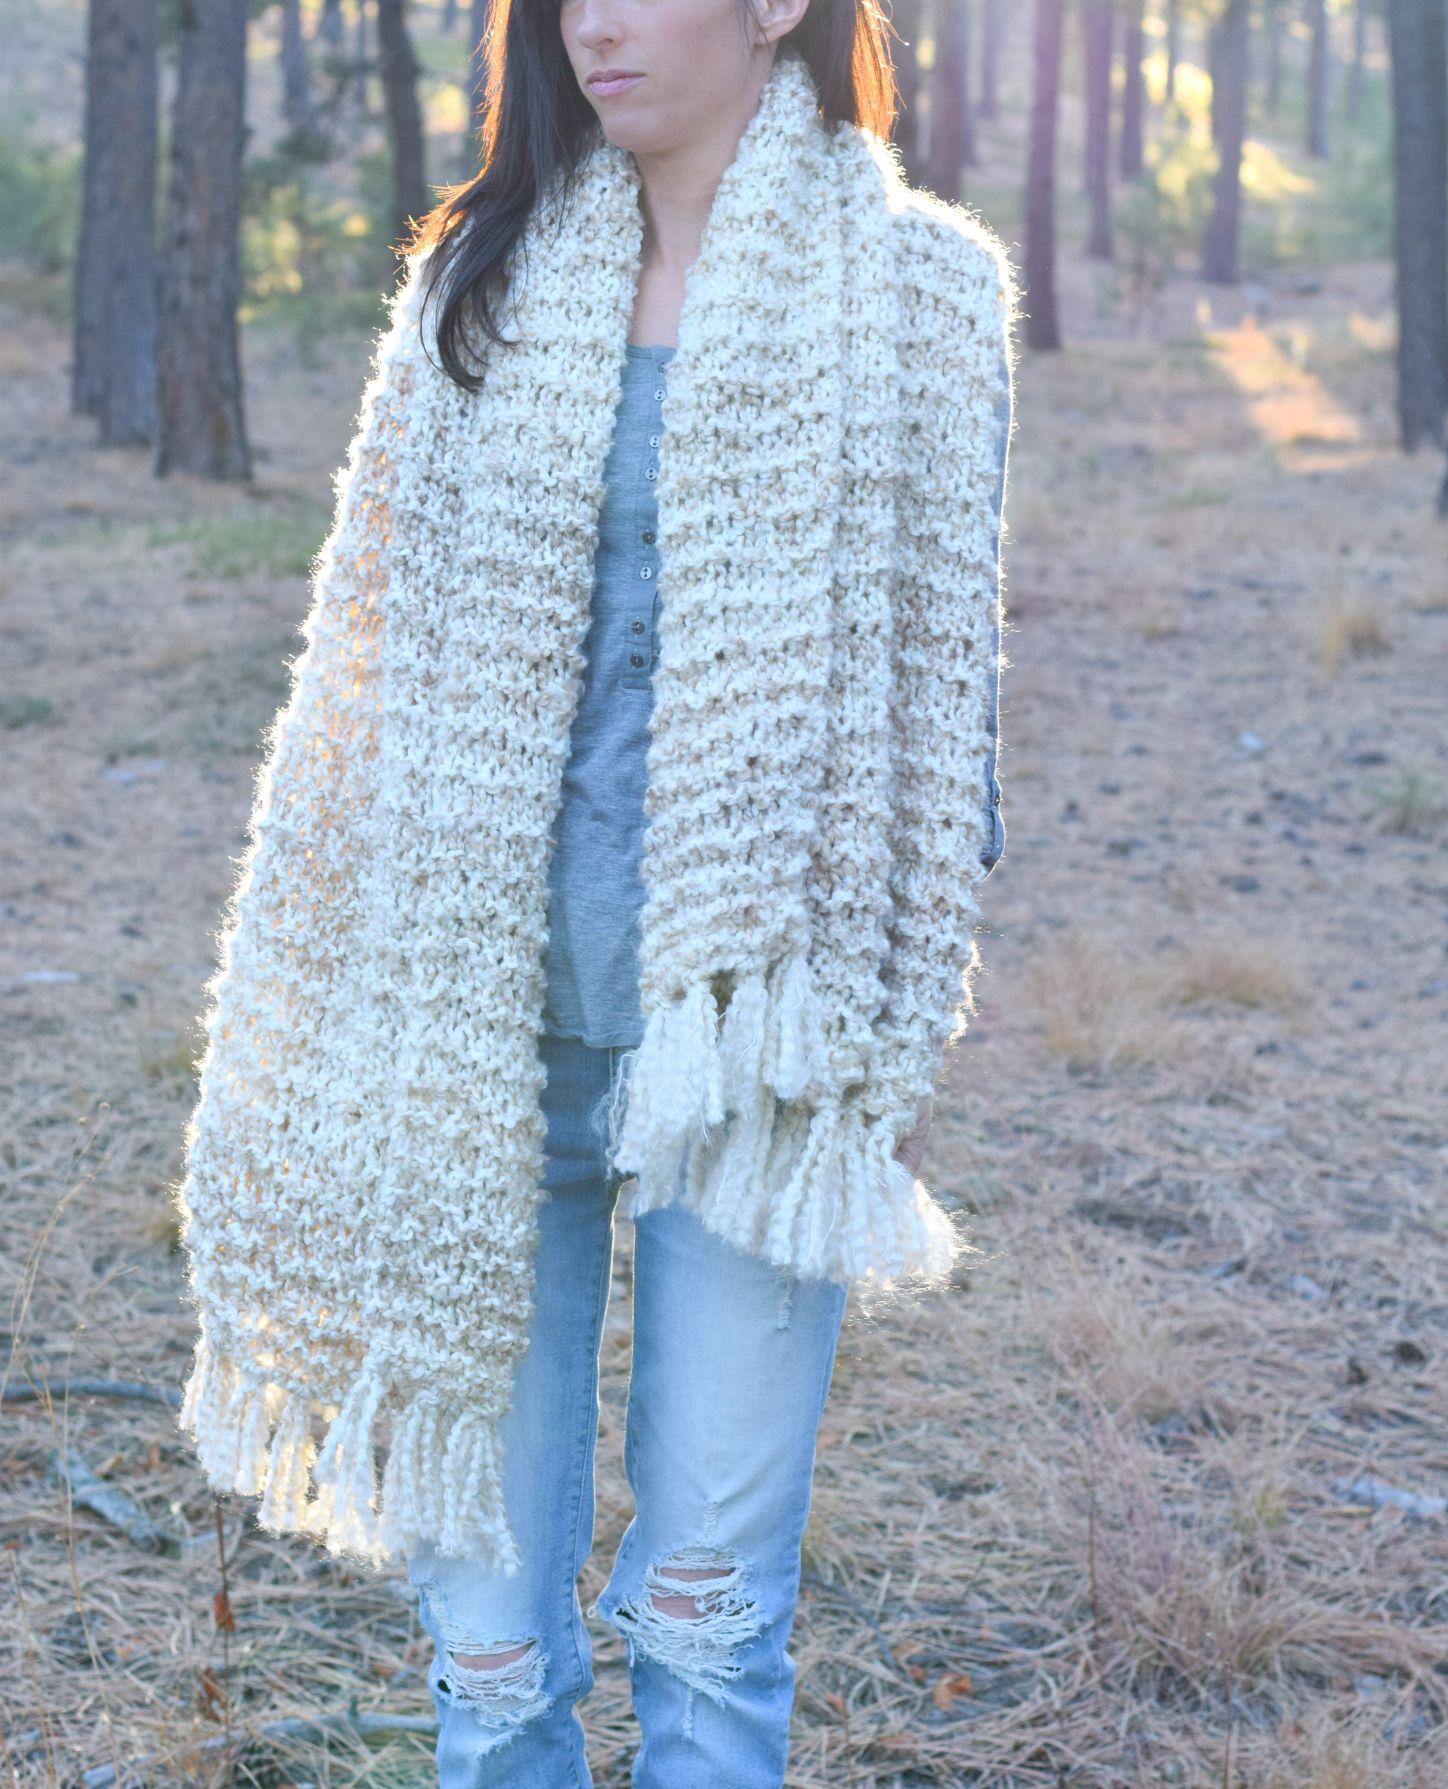 Sedona Serenity Knit Shawl Pattern | Serenity, Shawl and Stitch